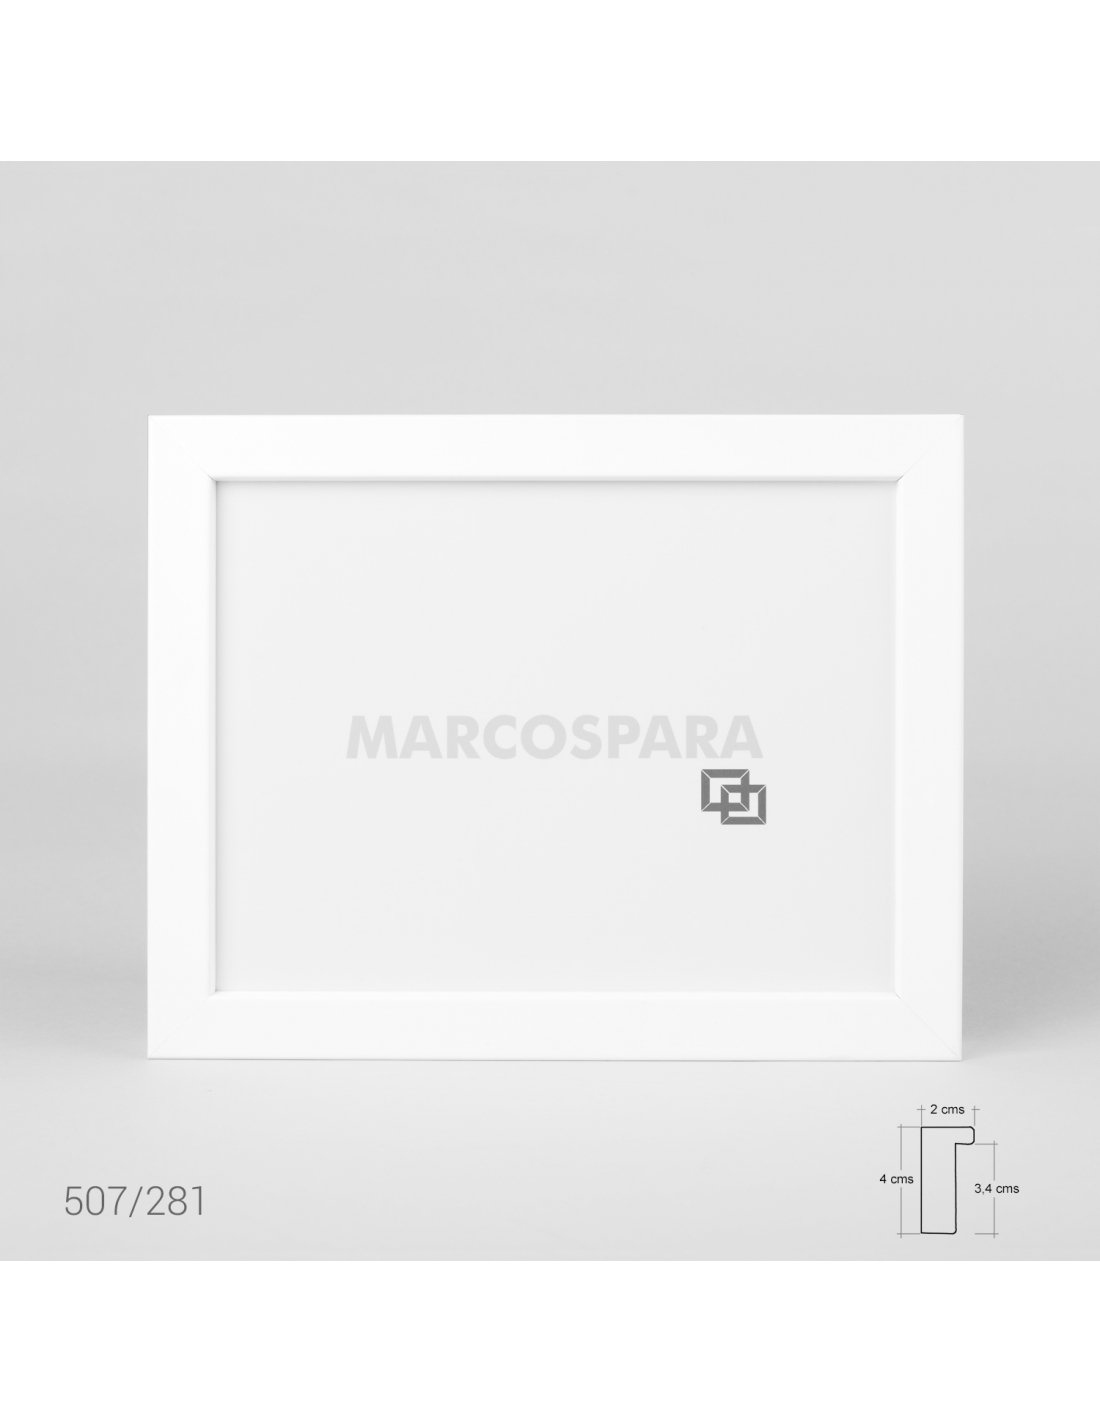 Marco de madera para Fotos M507